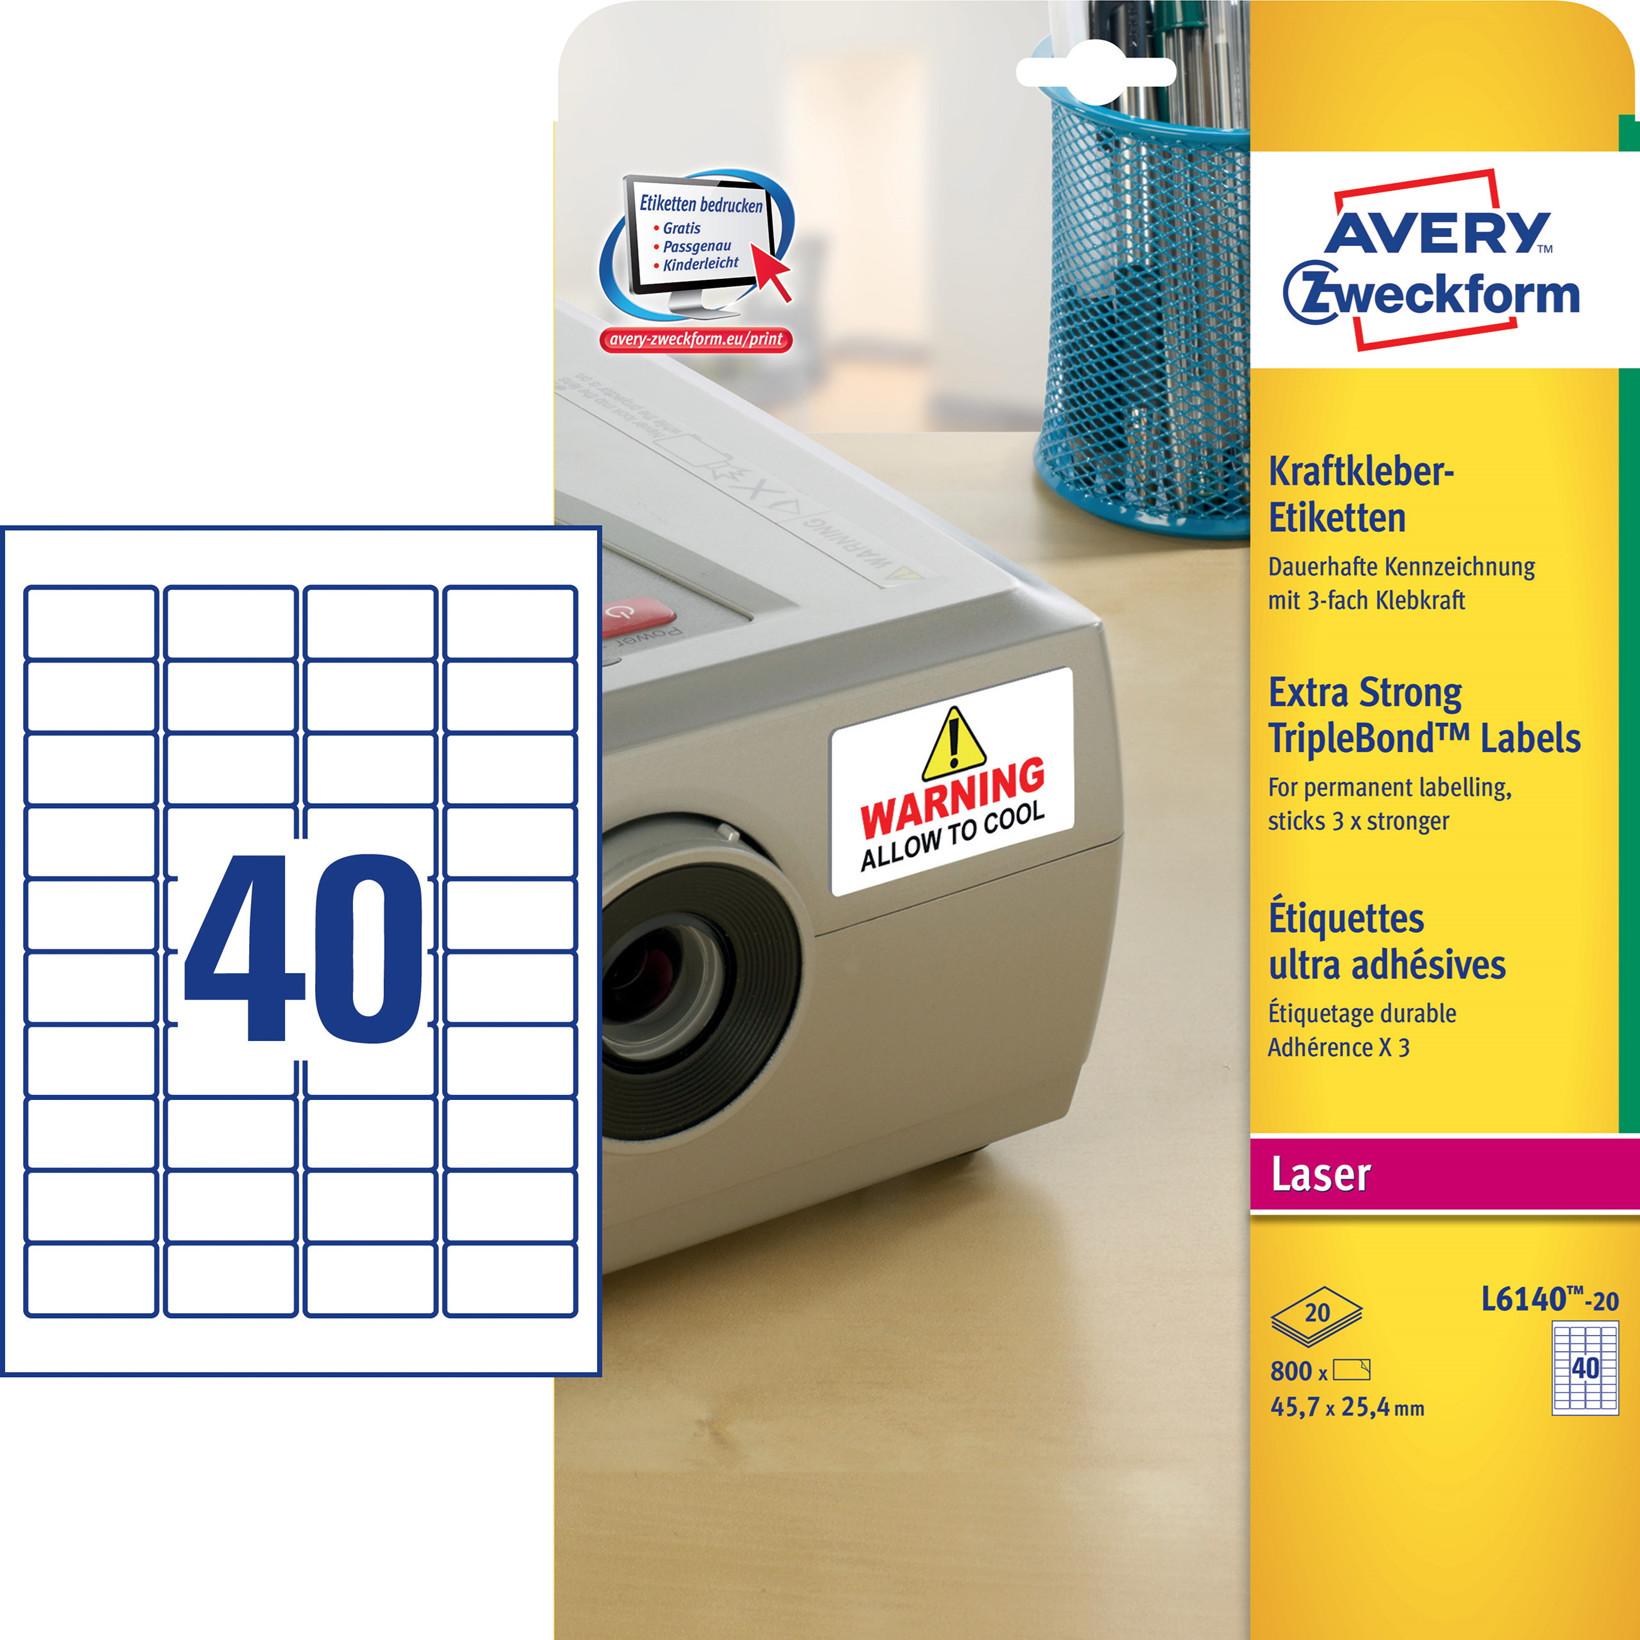 Avery L6140-20 - Laseretiket ekstra klæb hvid 40 pr. ark 45,7 x 25,4 mm - 20 ark